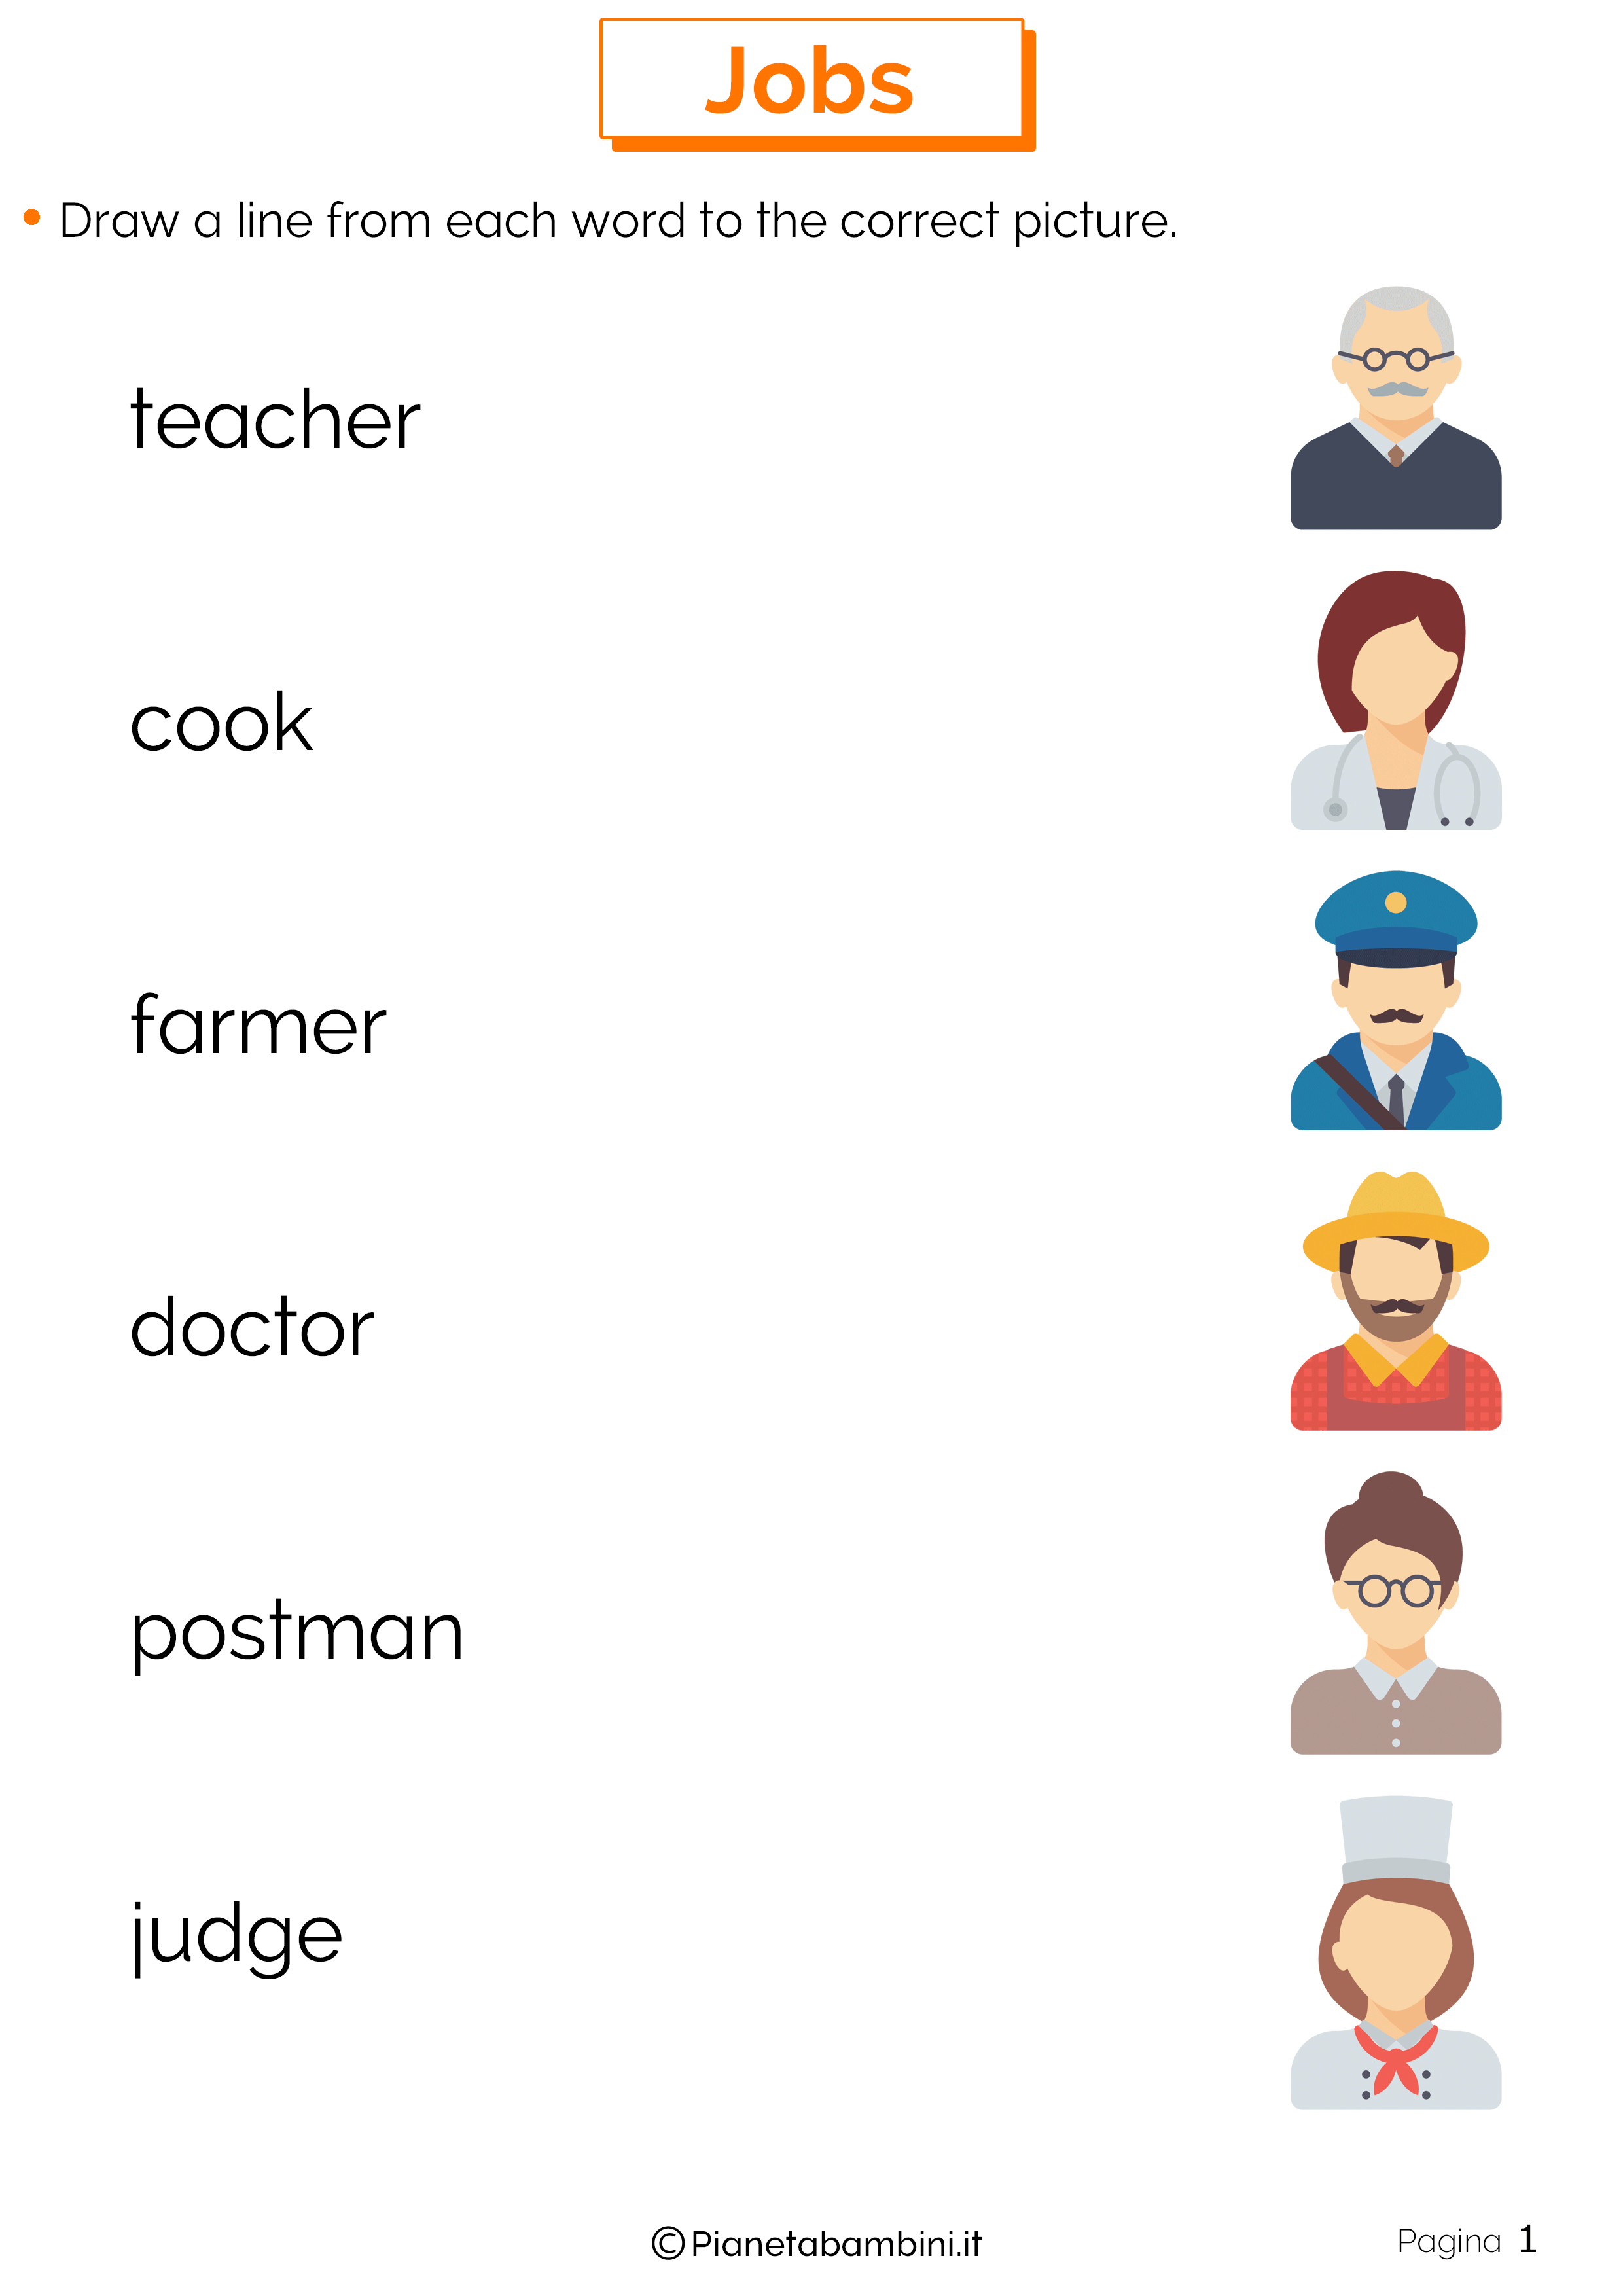 Scheda didattica sui mestieri in inglese 01